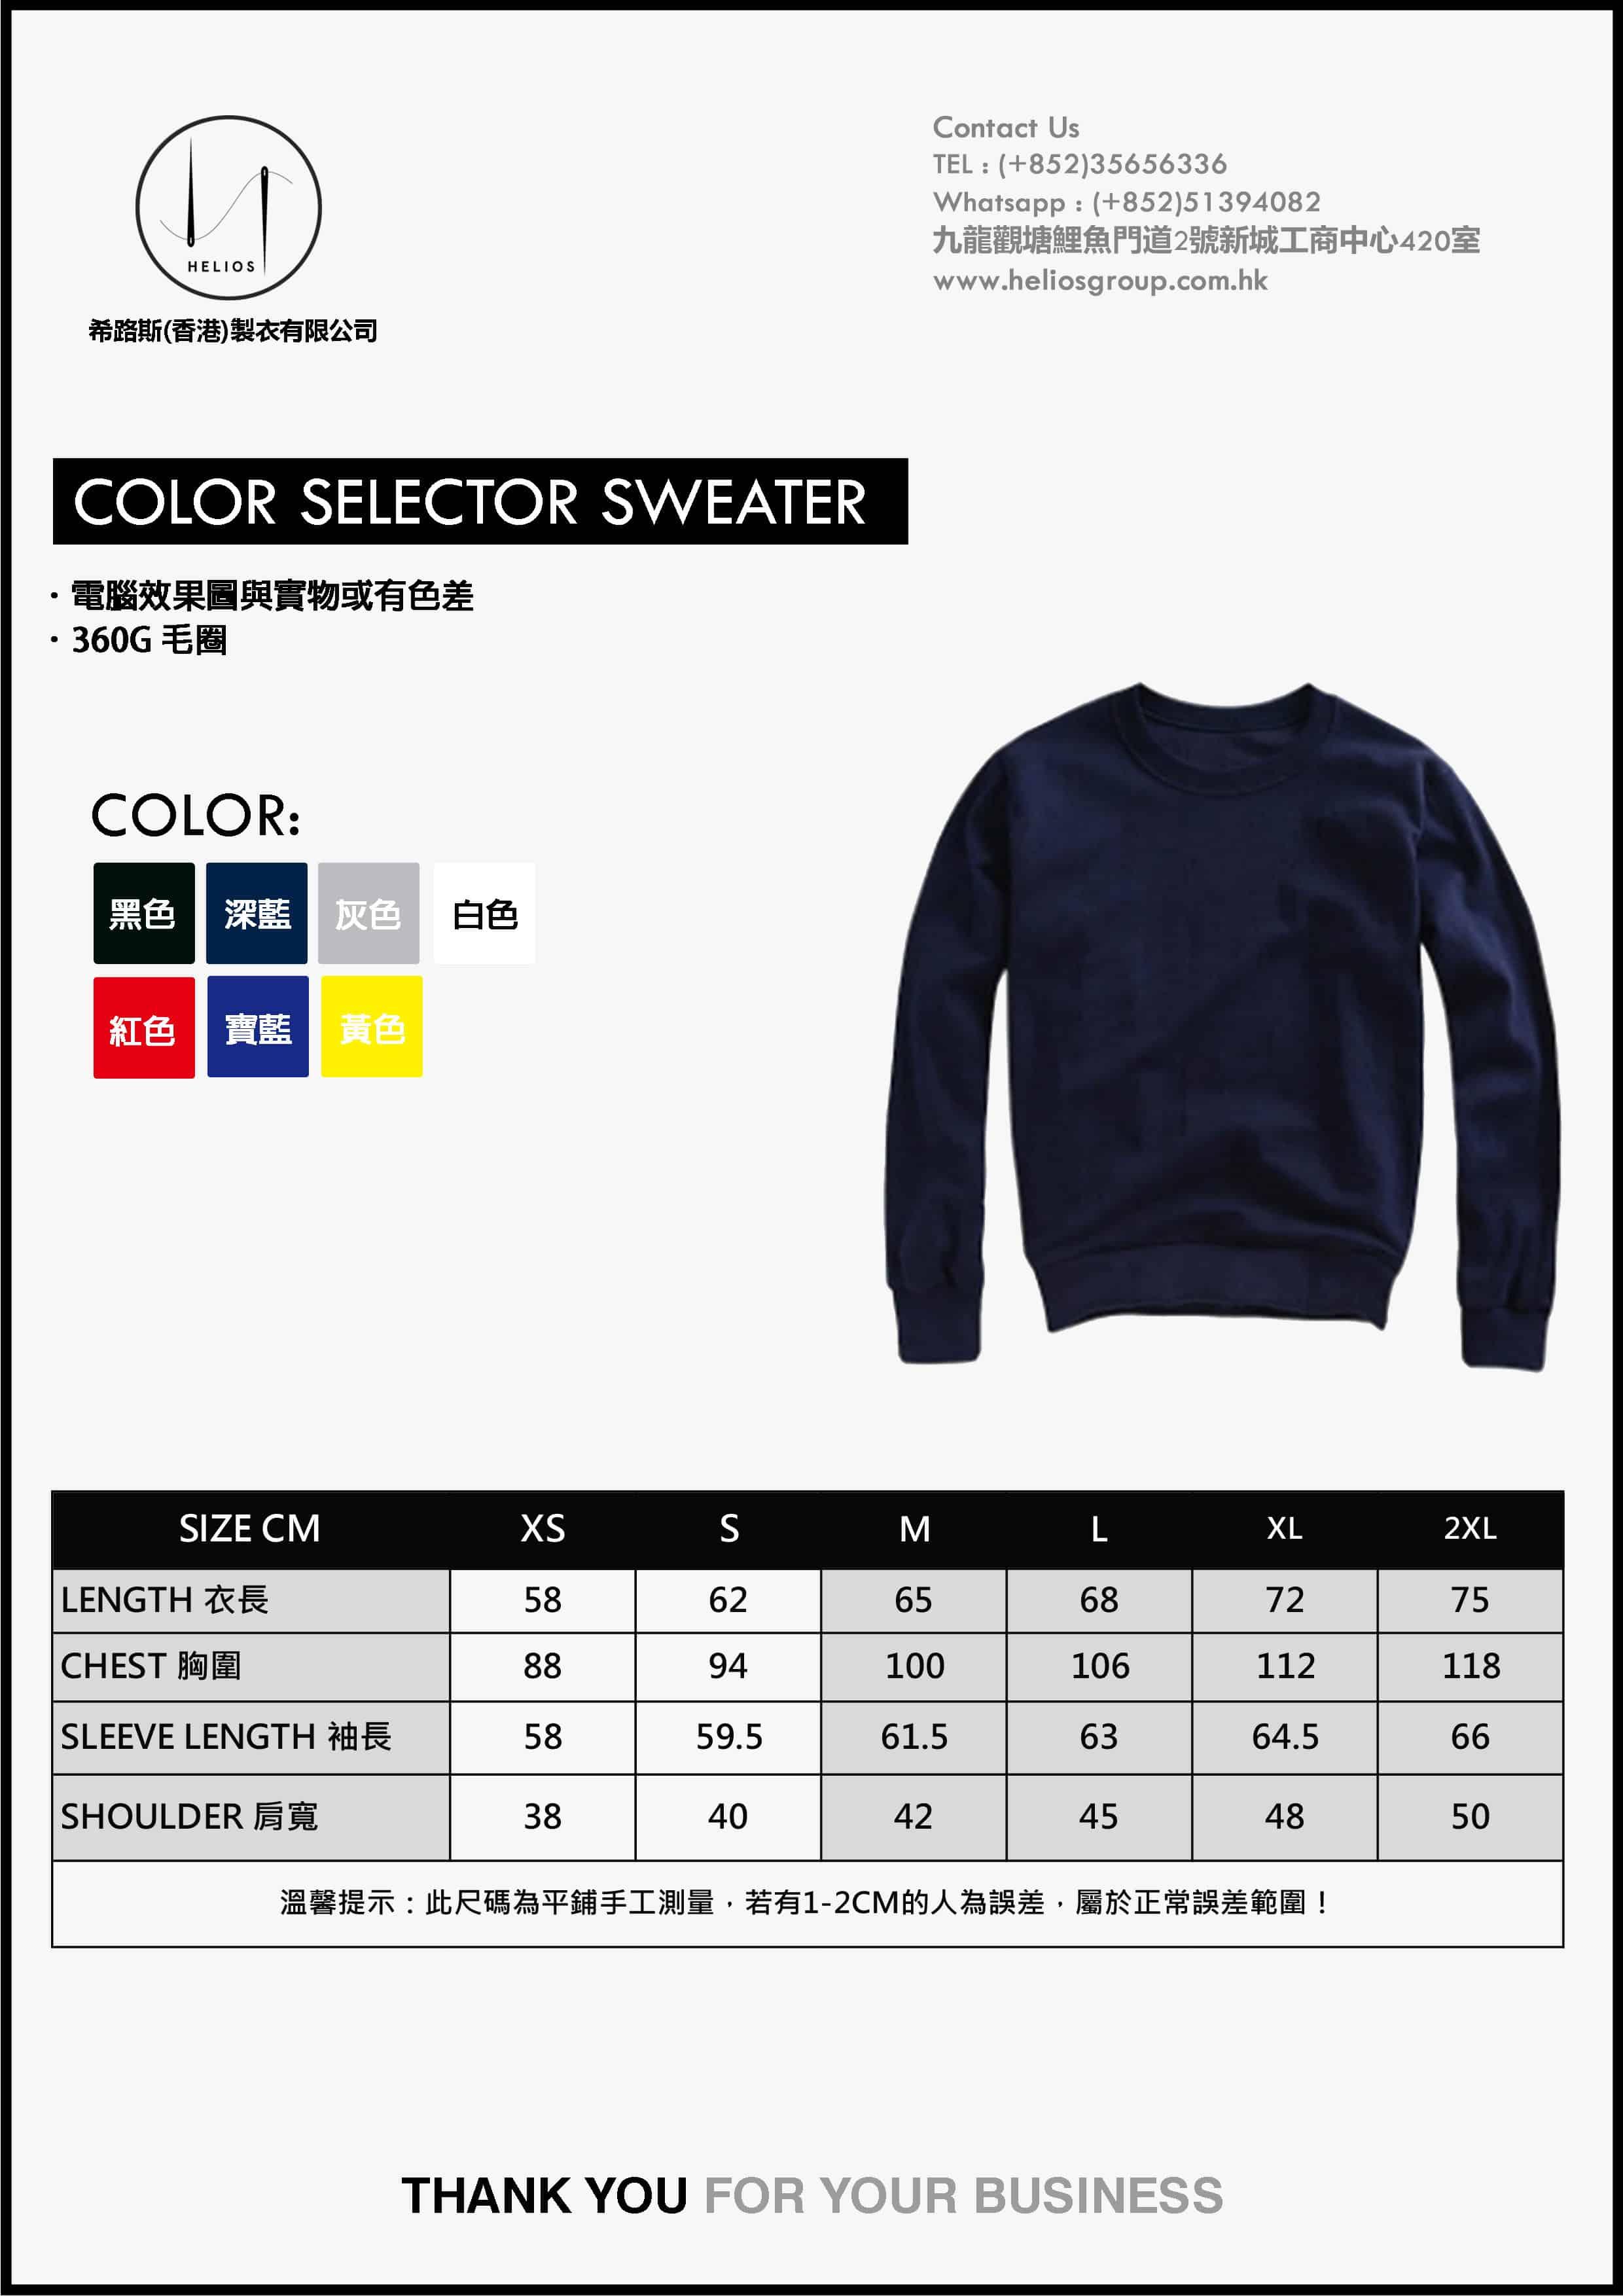 AG 360G sweater尺碼表